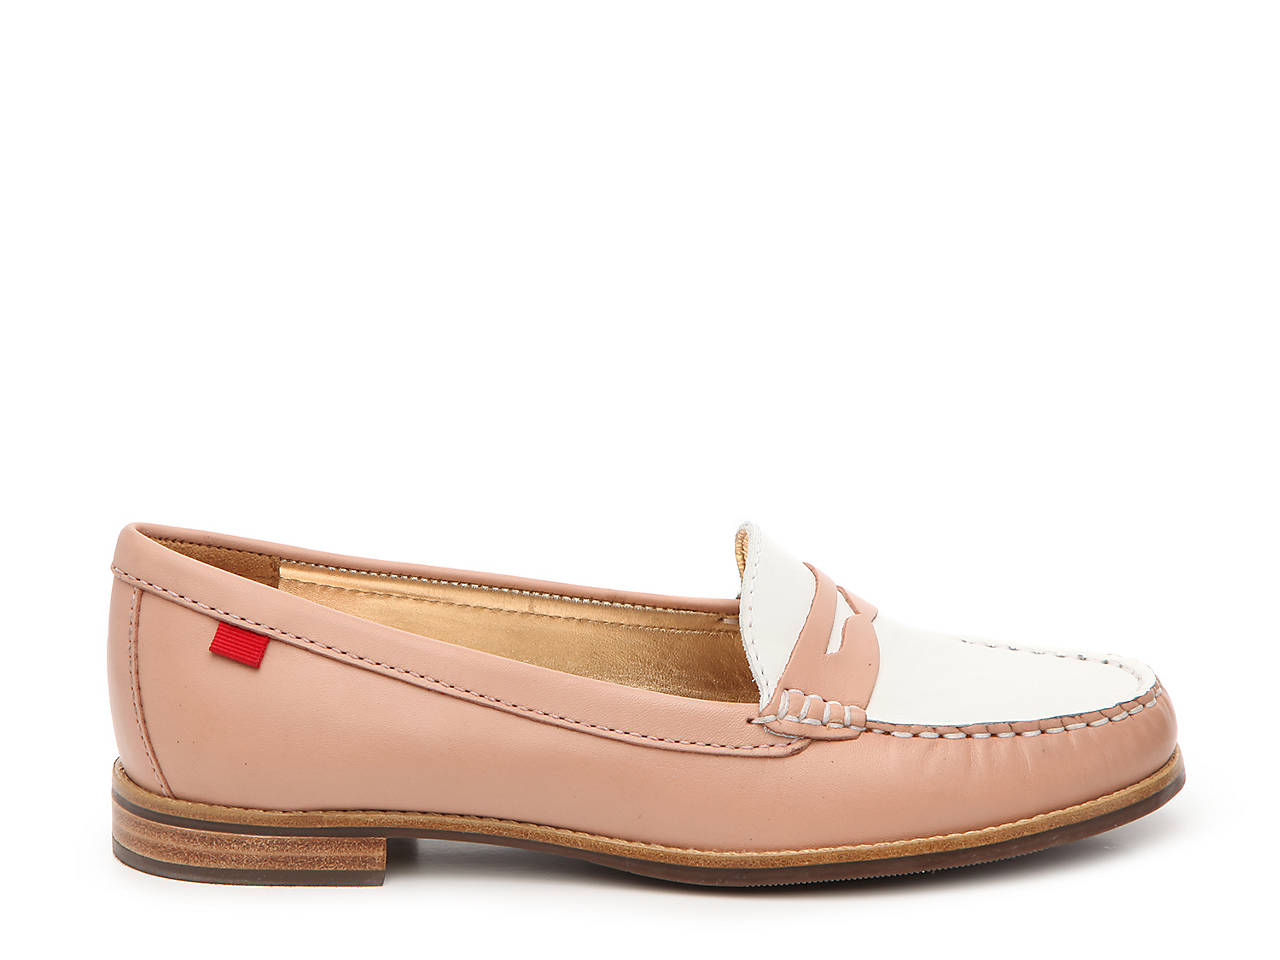 1bc5ce418b1 Marc Joseph New York East Village Loafer Women s Shoes